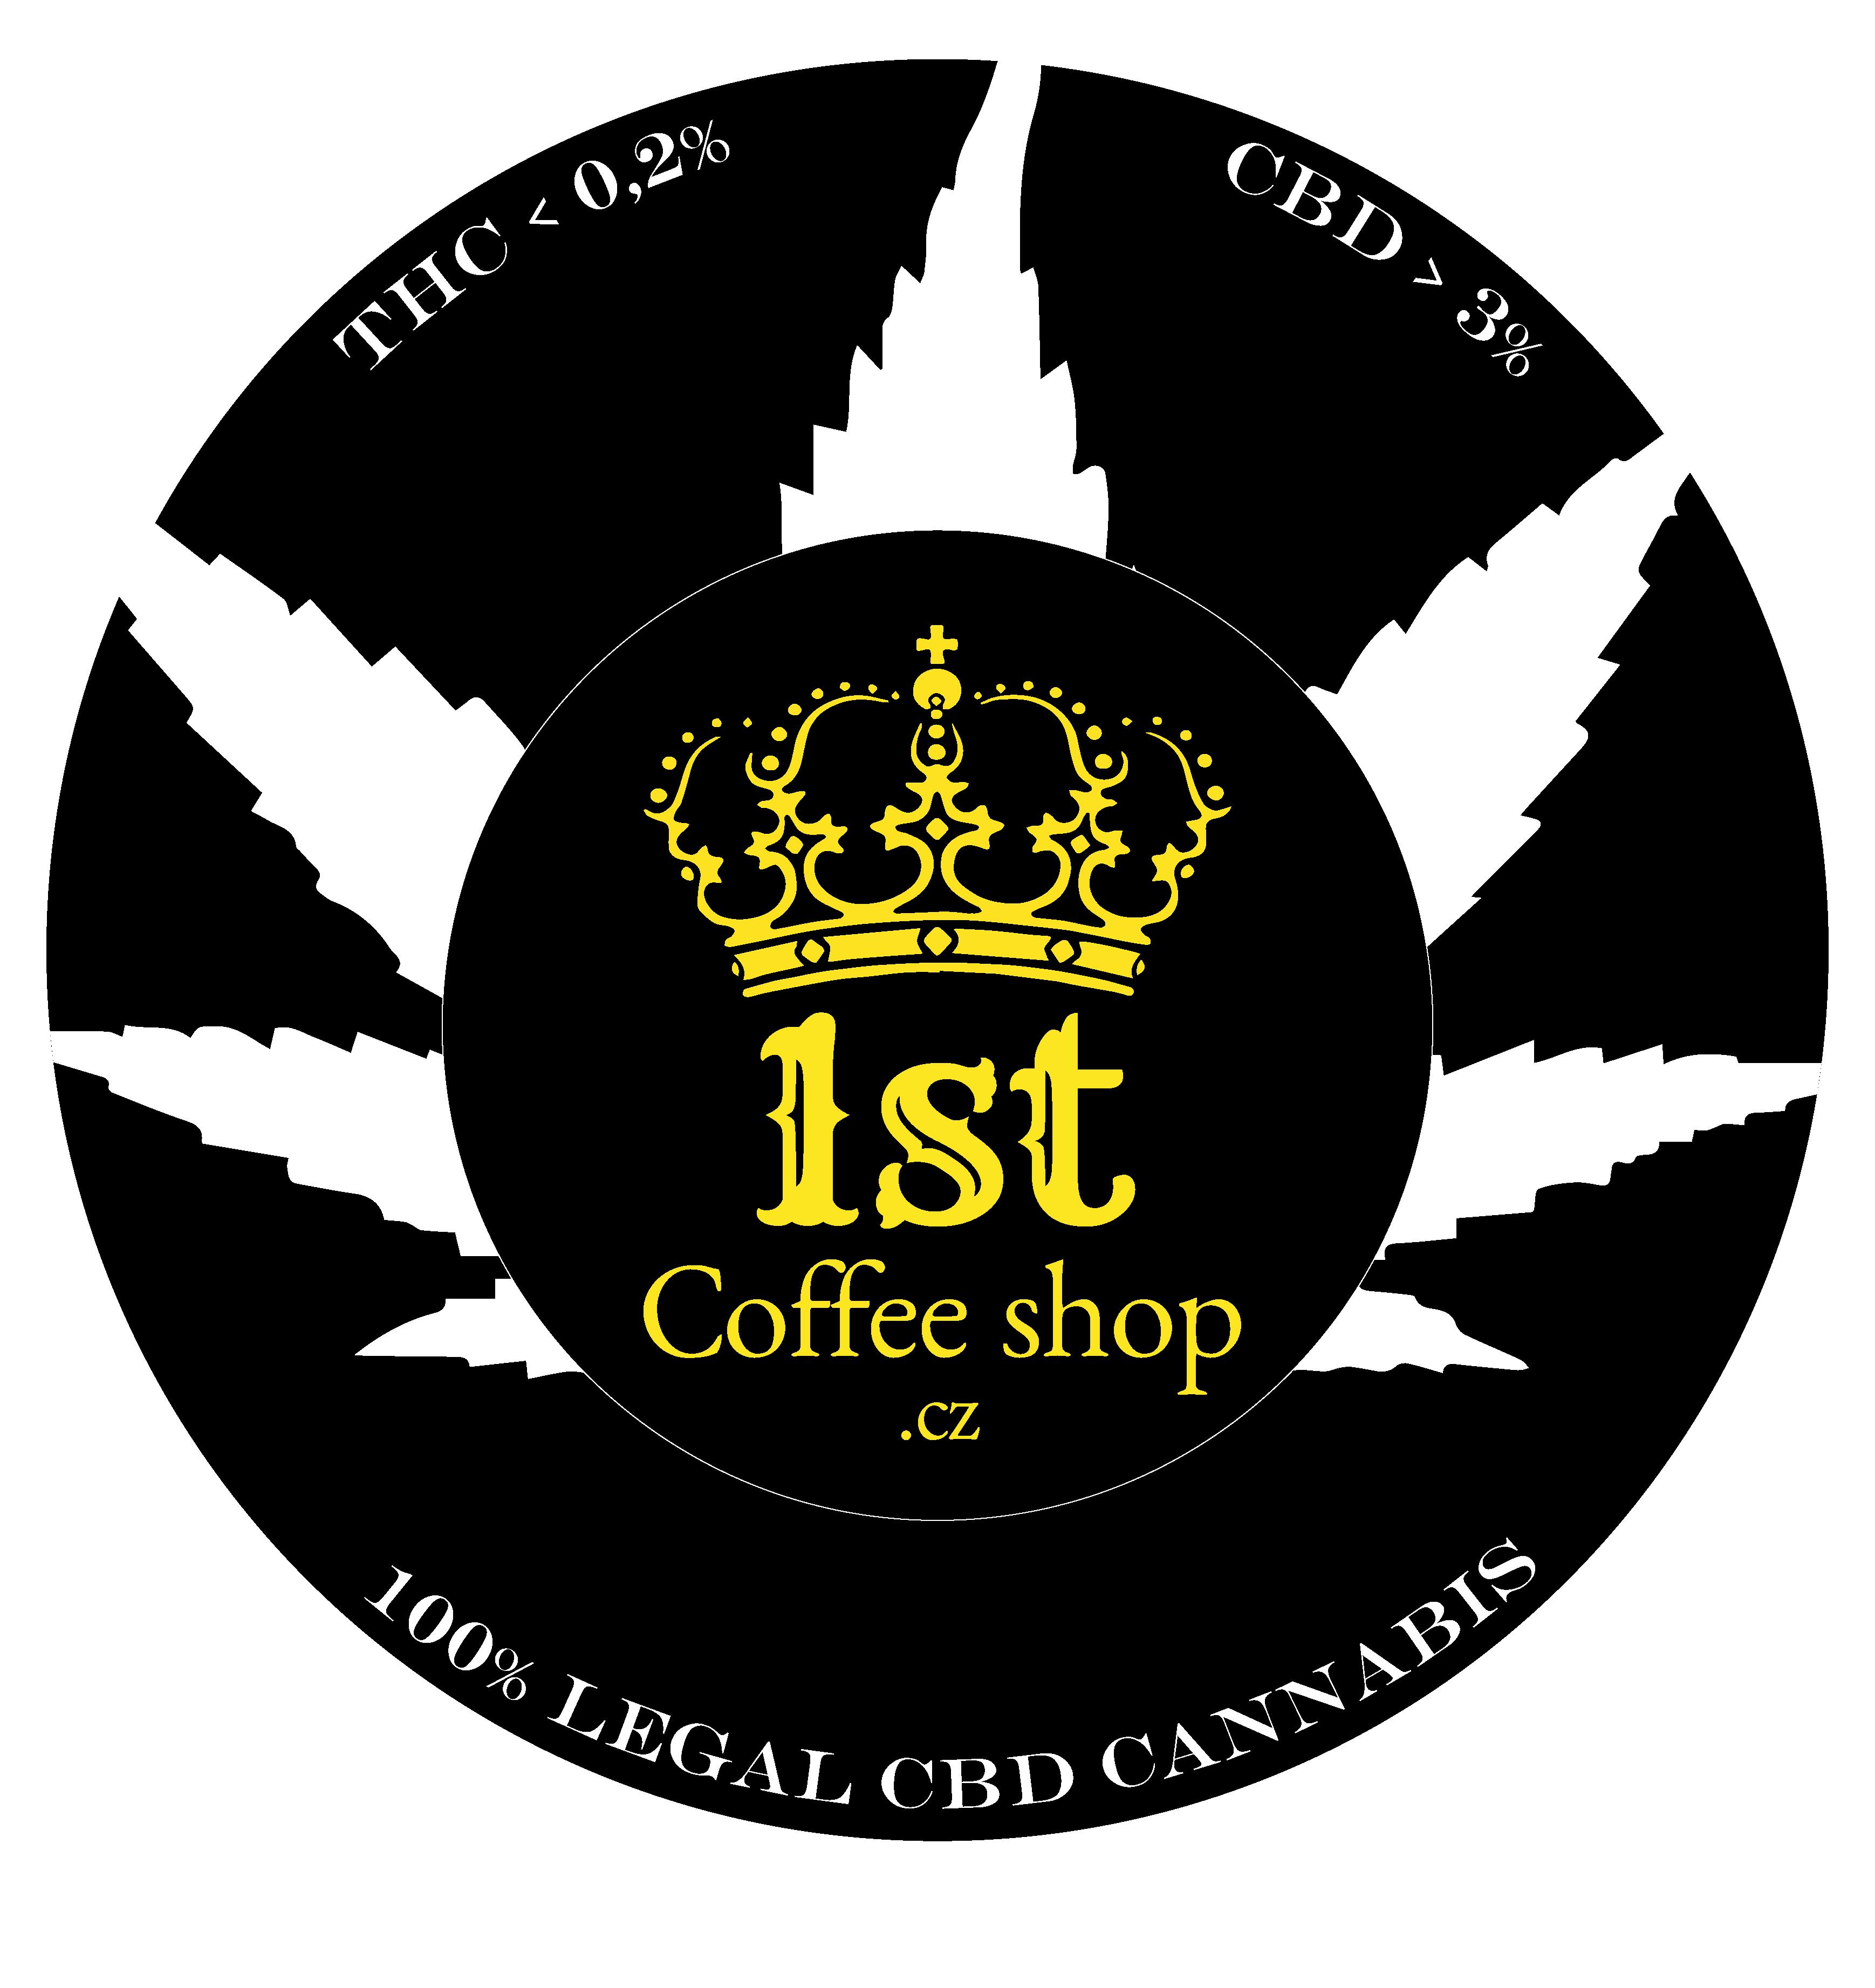 1stcoffeeshop.cz